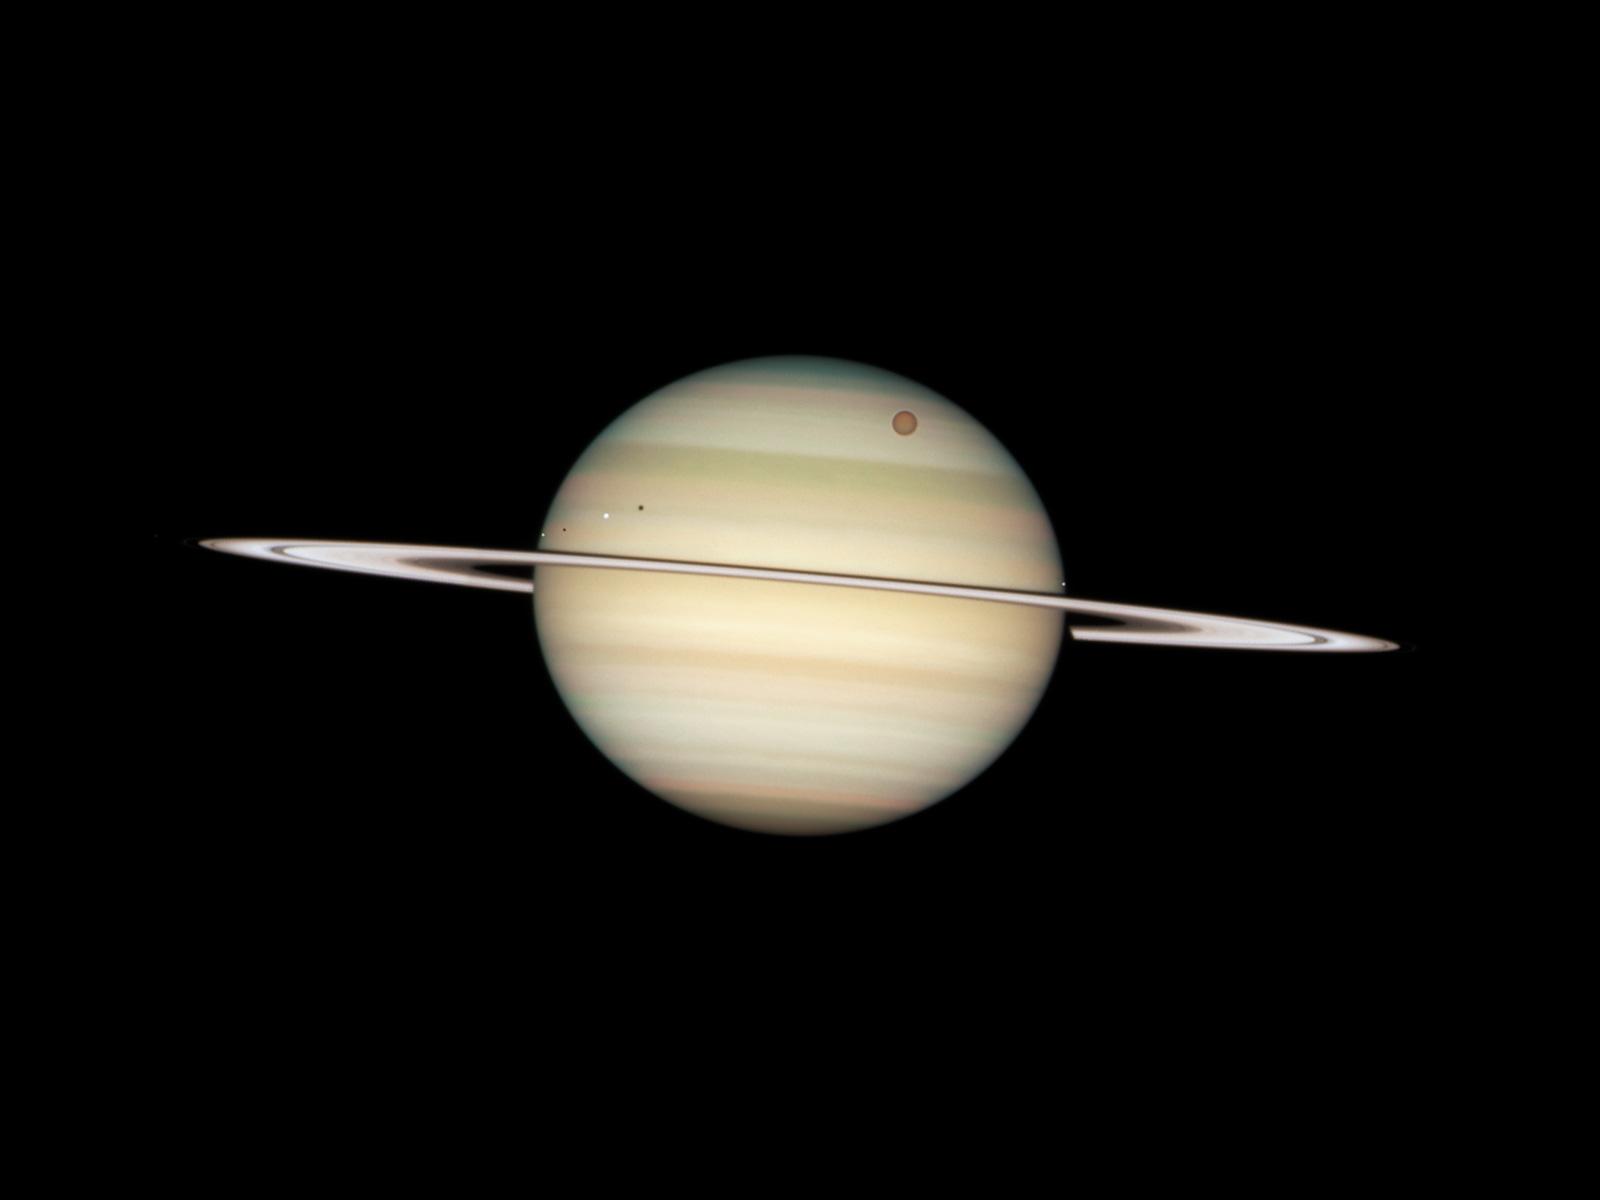 Quadruple Saturn moon transit snapped by Hubble   ESA/Hubble